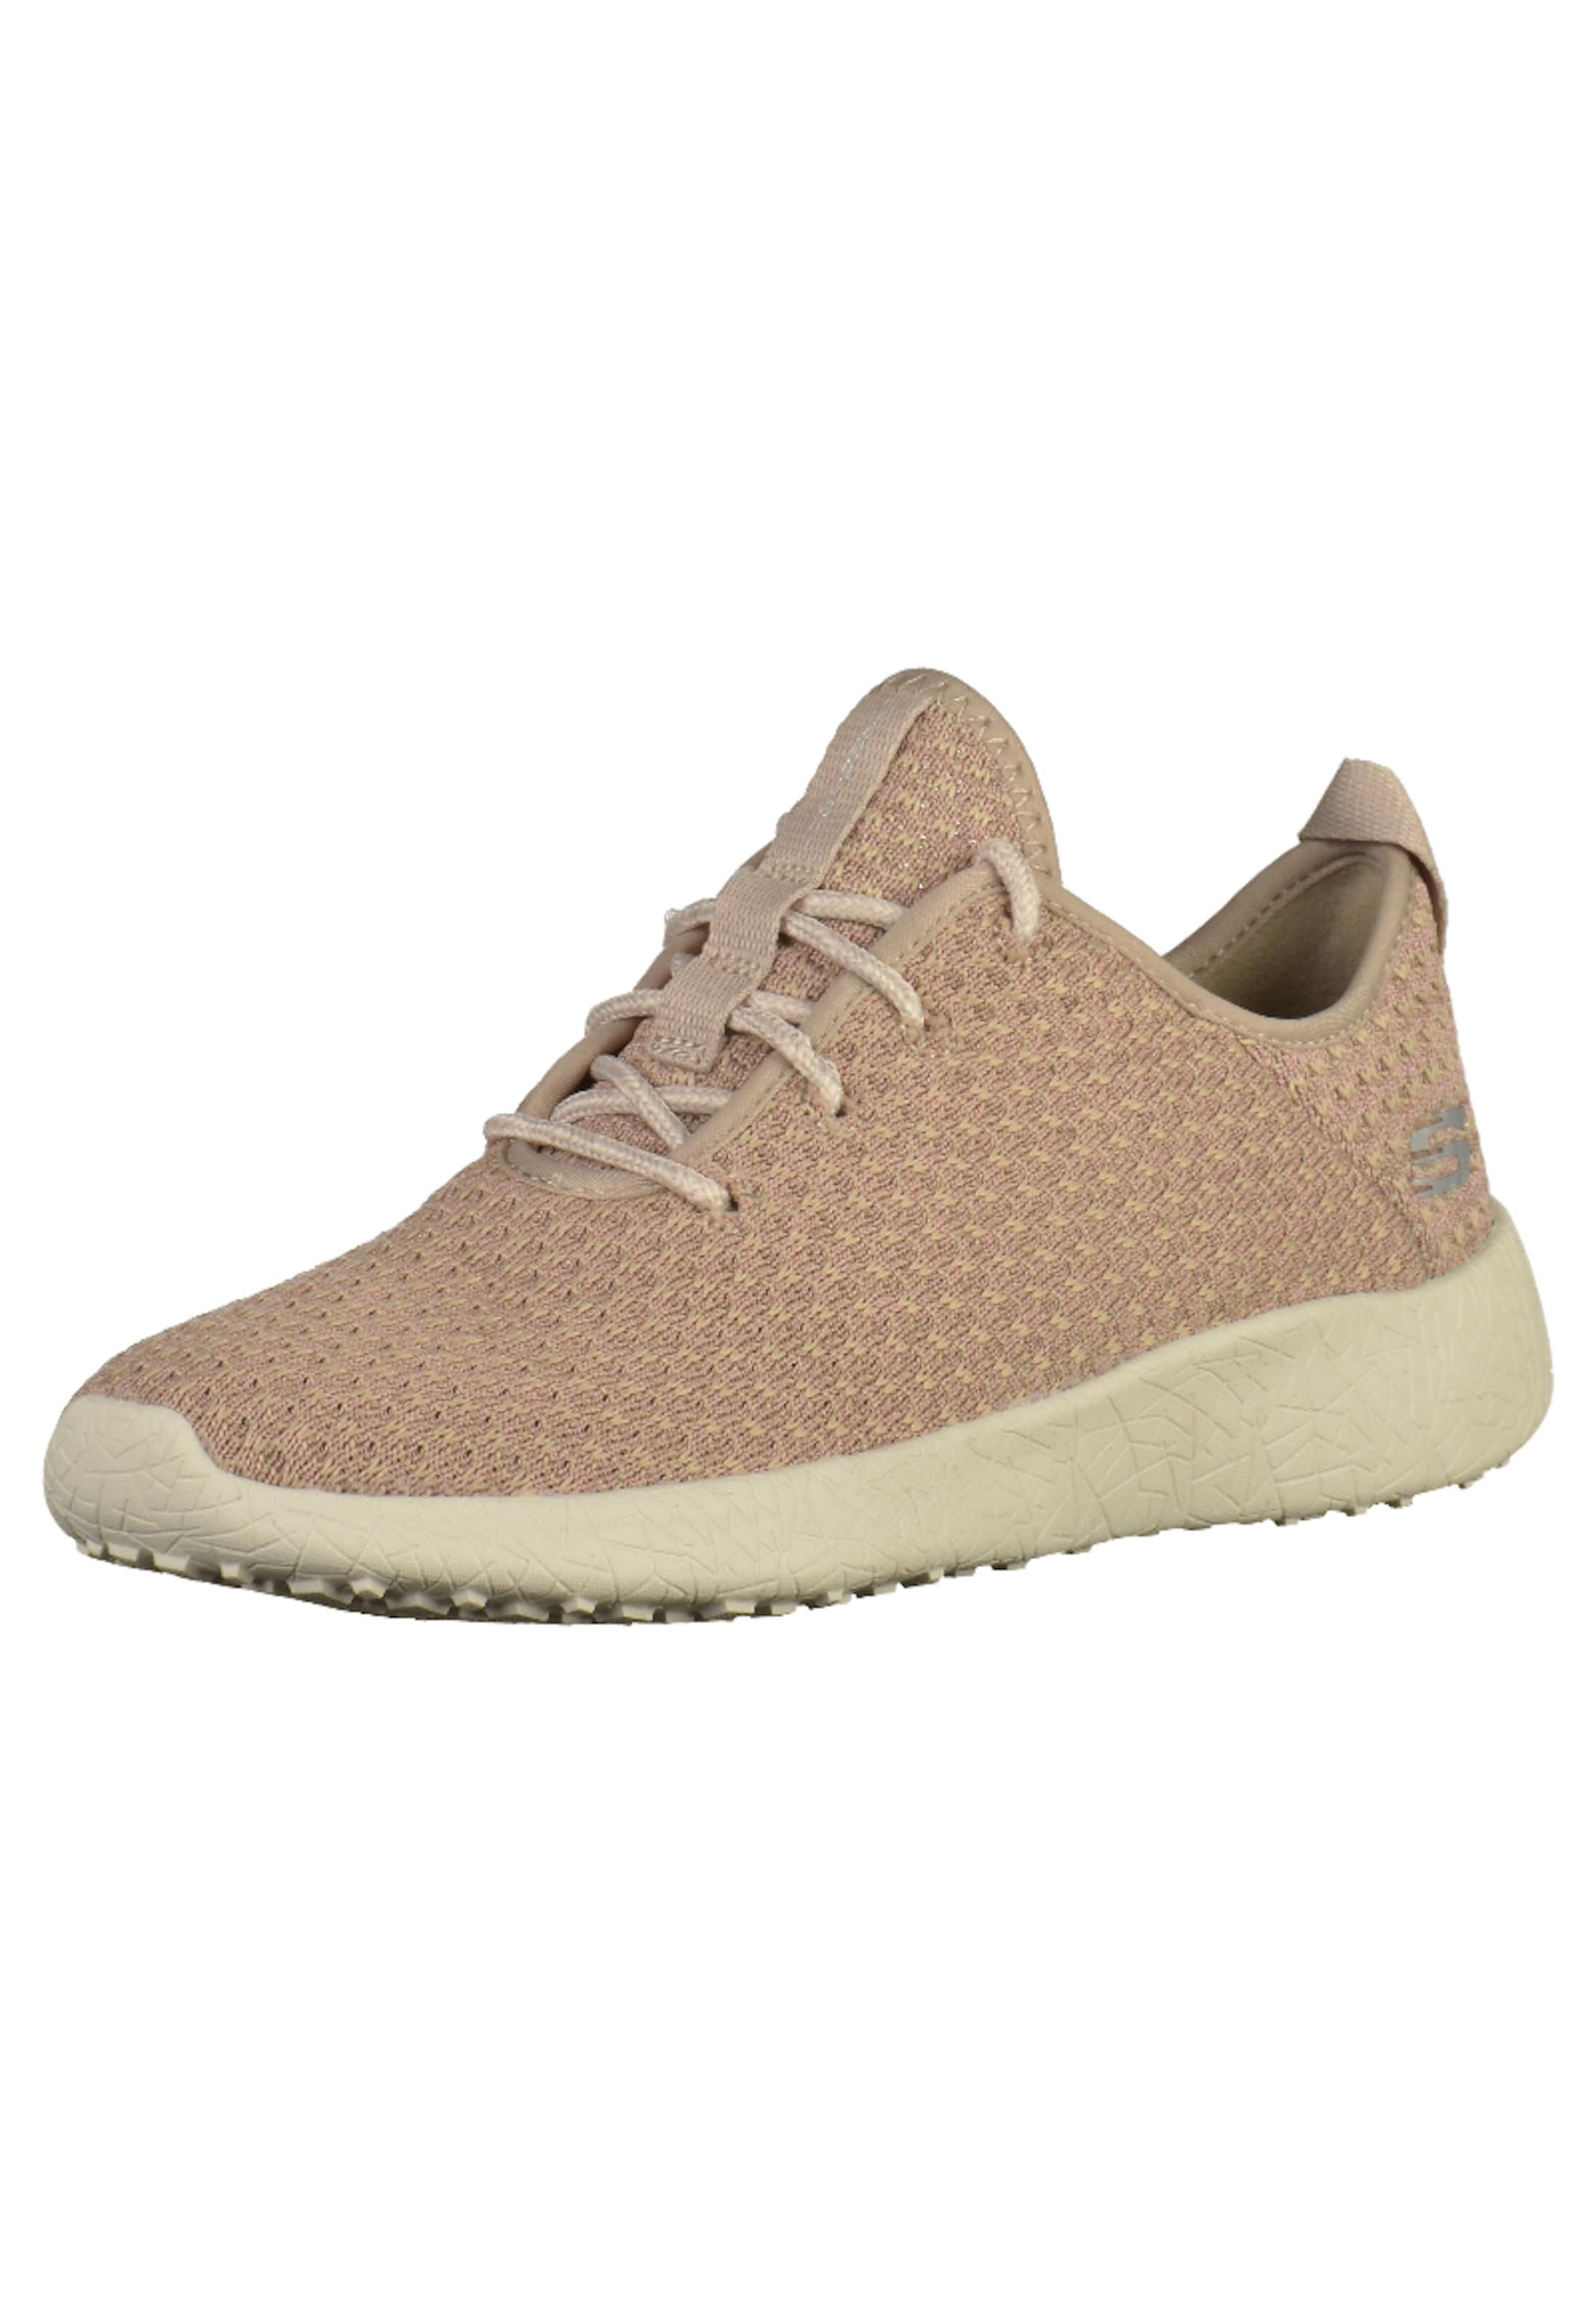 Haltbare Mode billige Schuhe SKECHERS | Sneaker Schuhe Gut getragene Schuhe